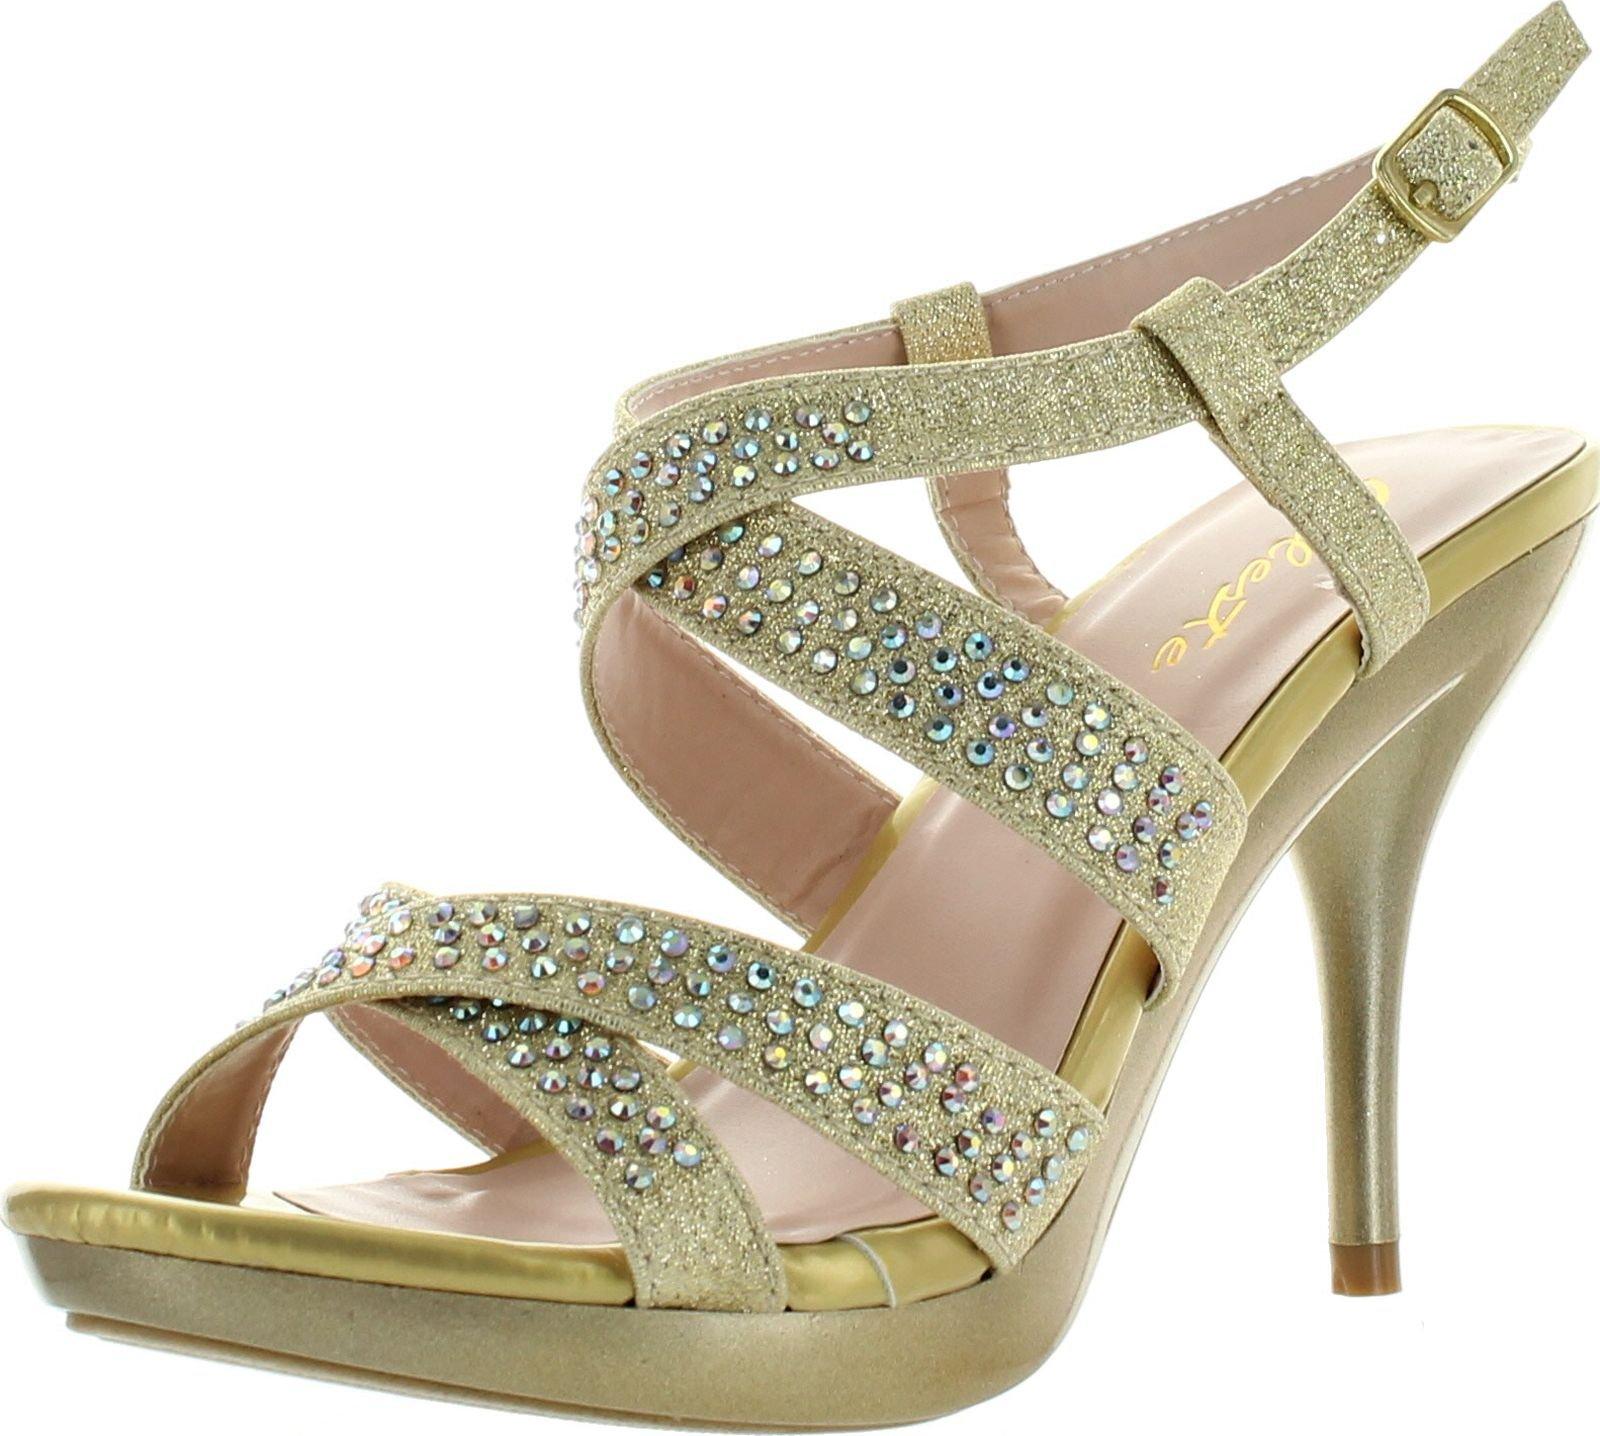 Celeste Womens Lynn-03 Strappy Dress Bridesmaid Prom Party Sandal Pumps,Gold,7